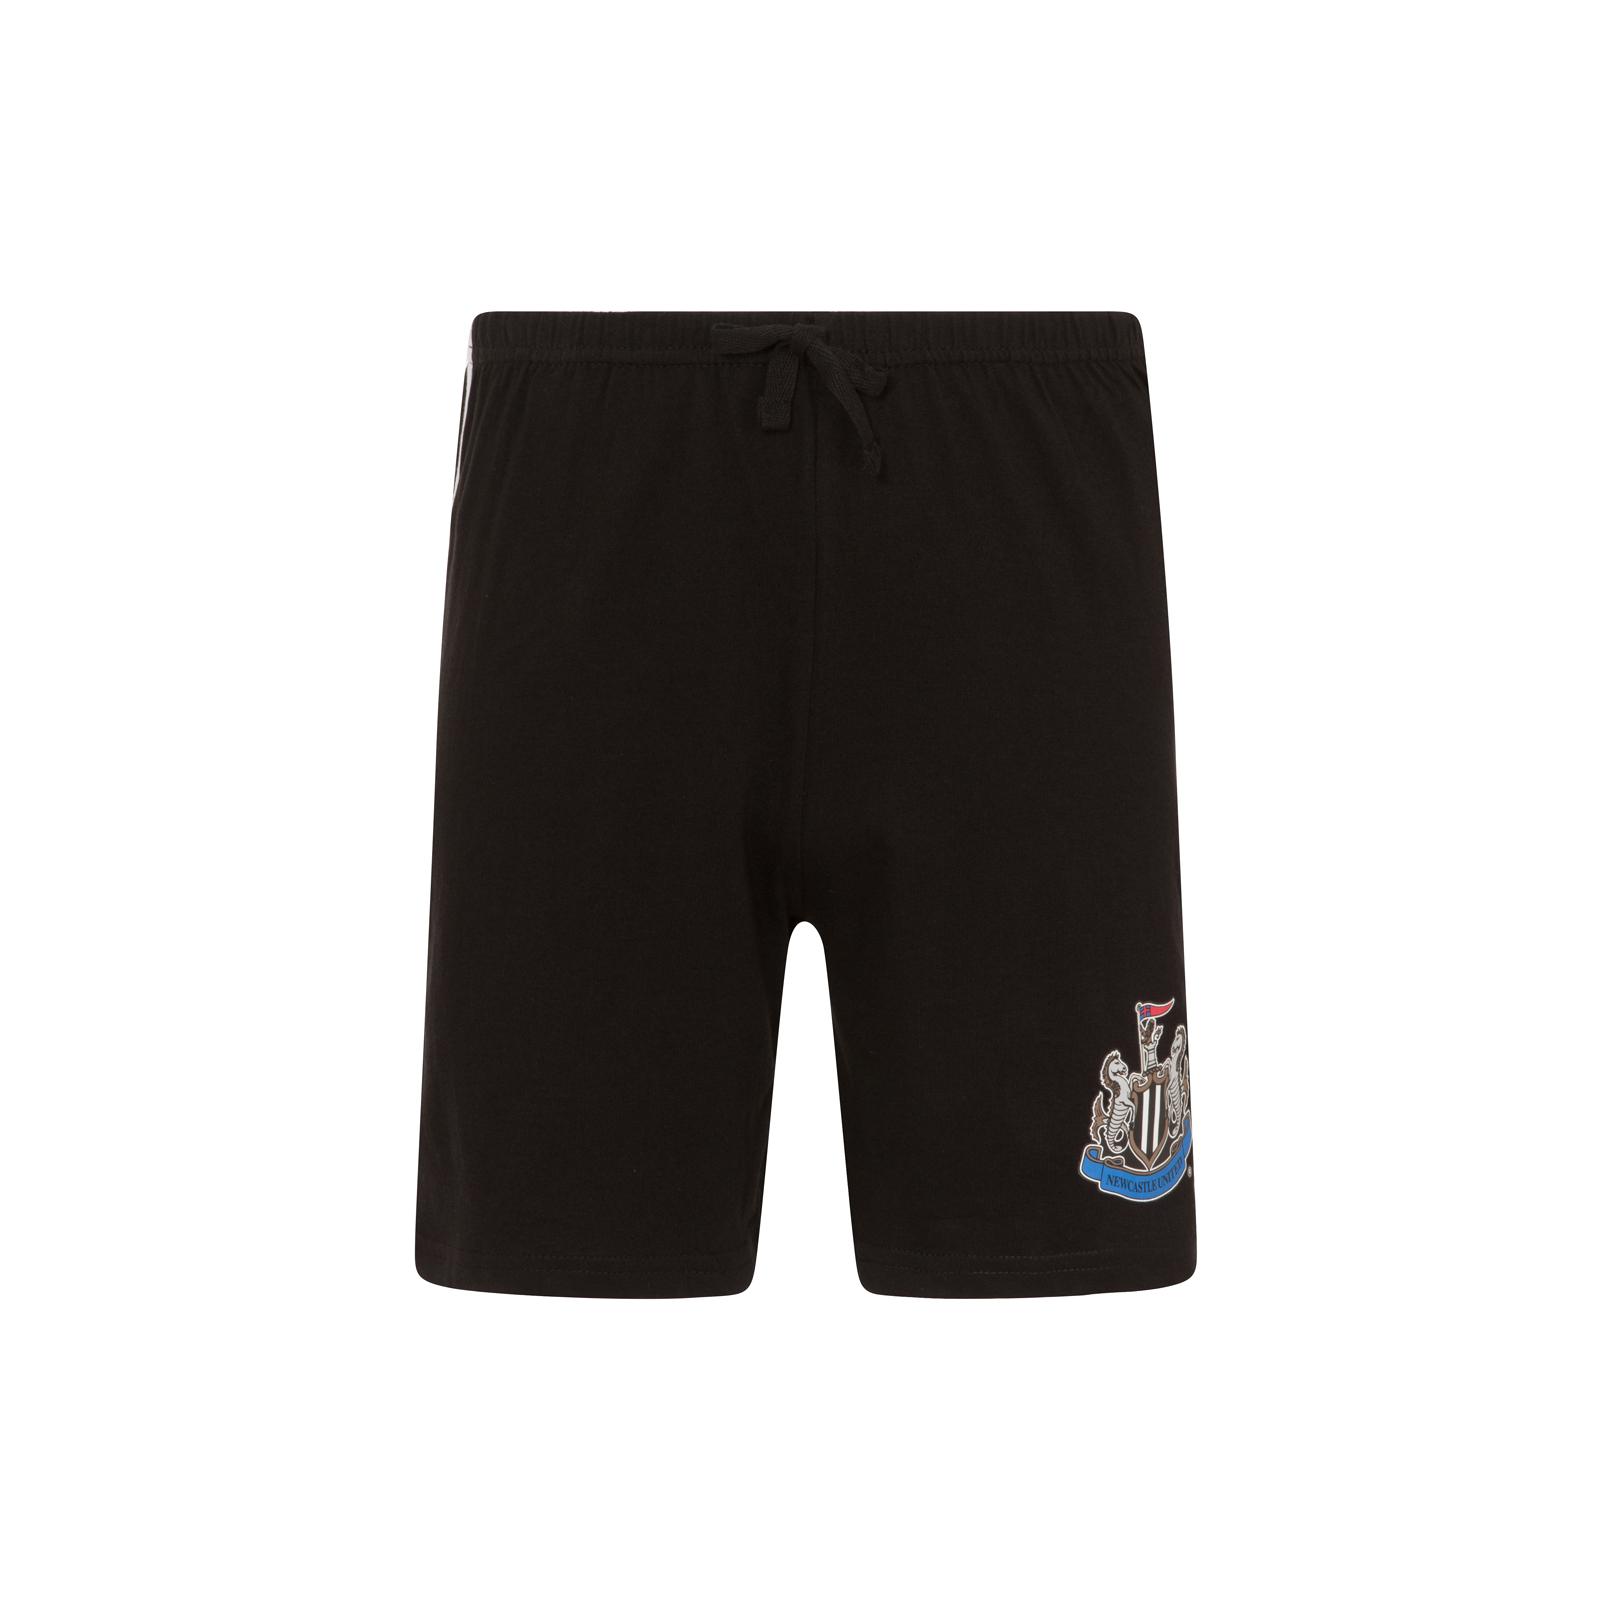 Newcastle-United-FC-Official-Football-Gift-Boys-Short-Pyjamas thumbnail 6